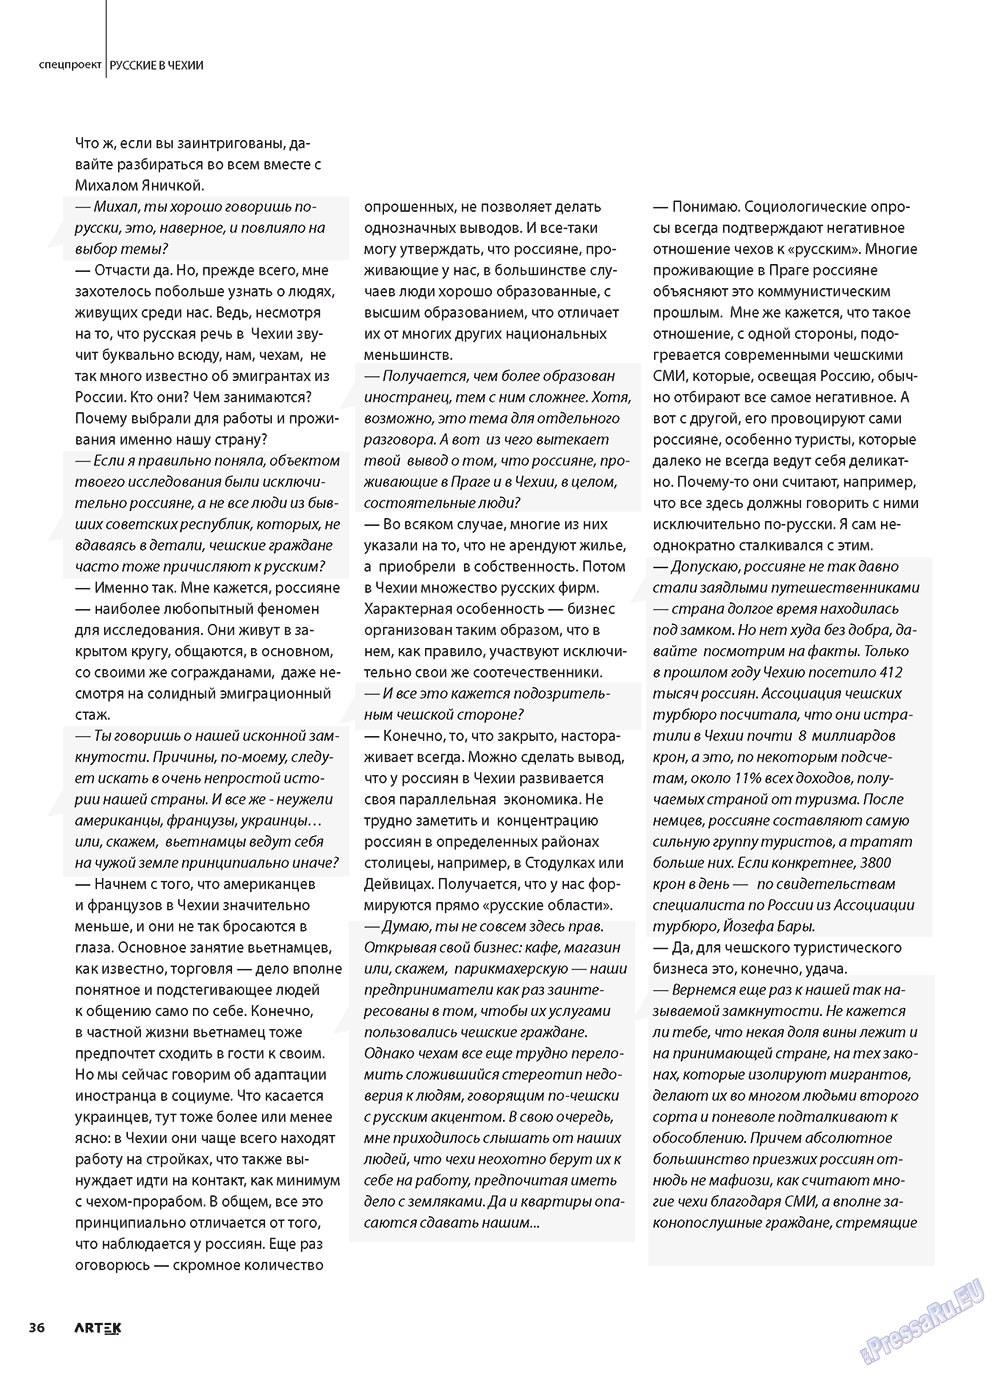 Артек (журнал). 2011 год, номер 2, стр. 38